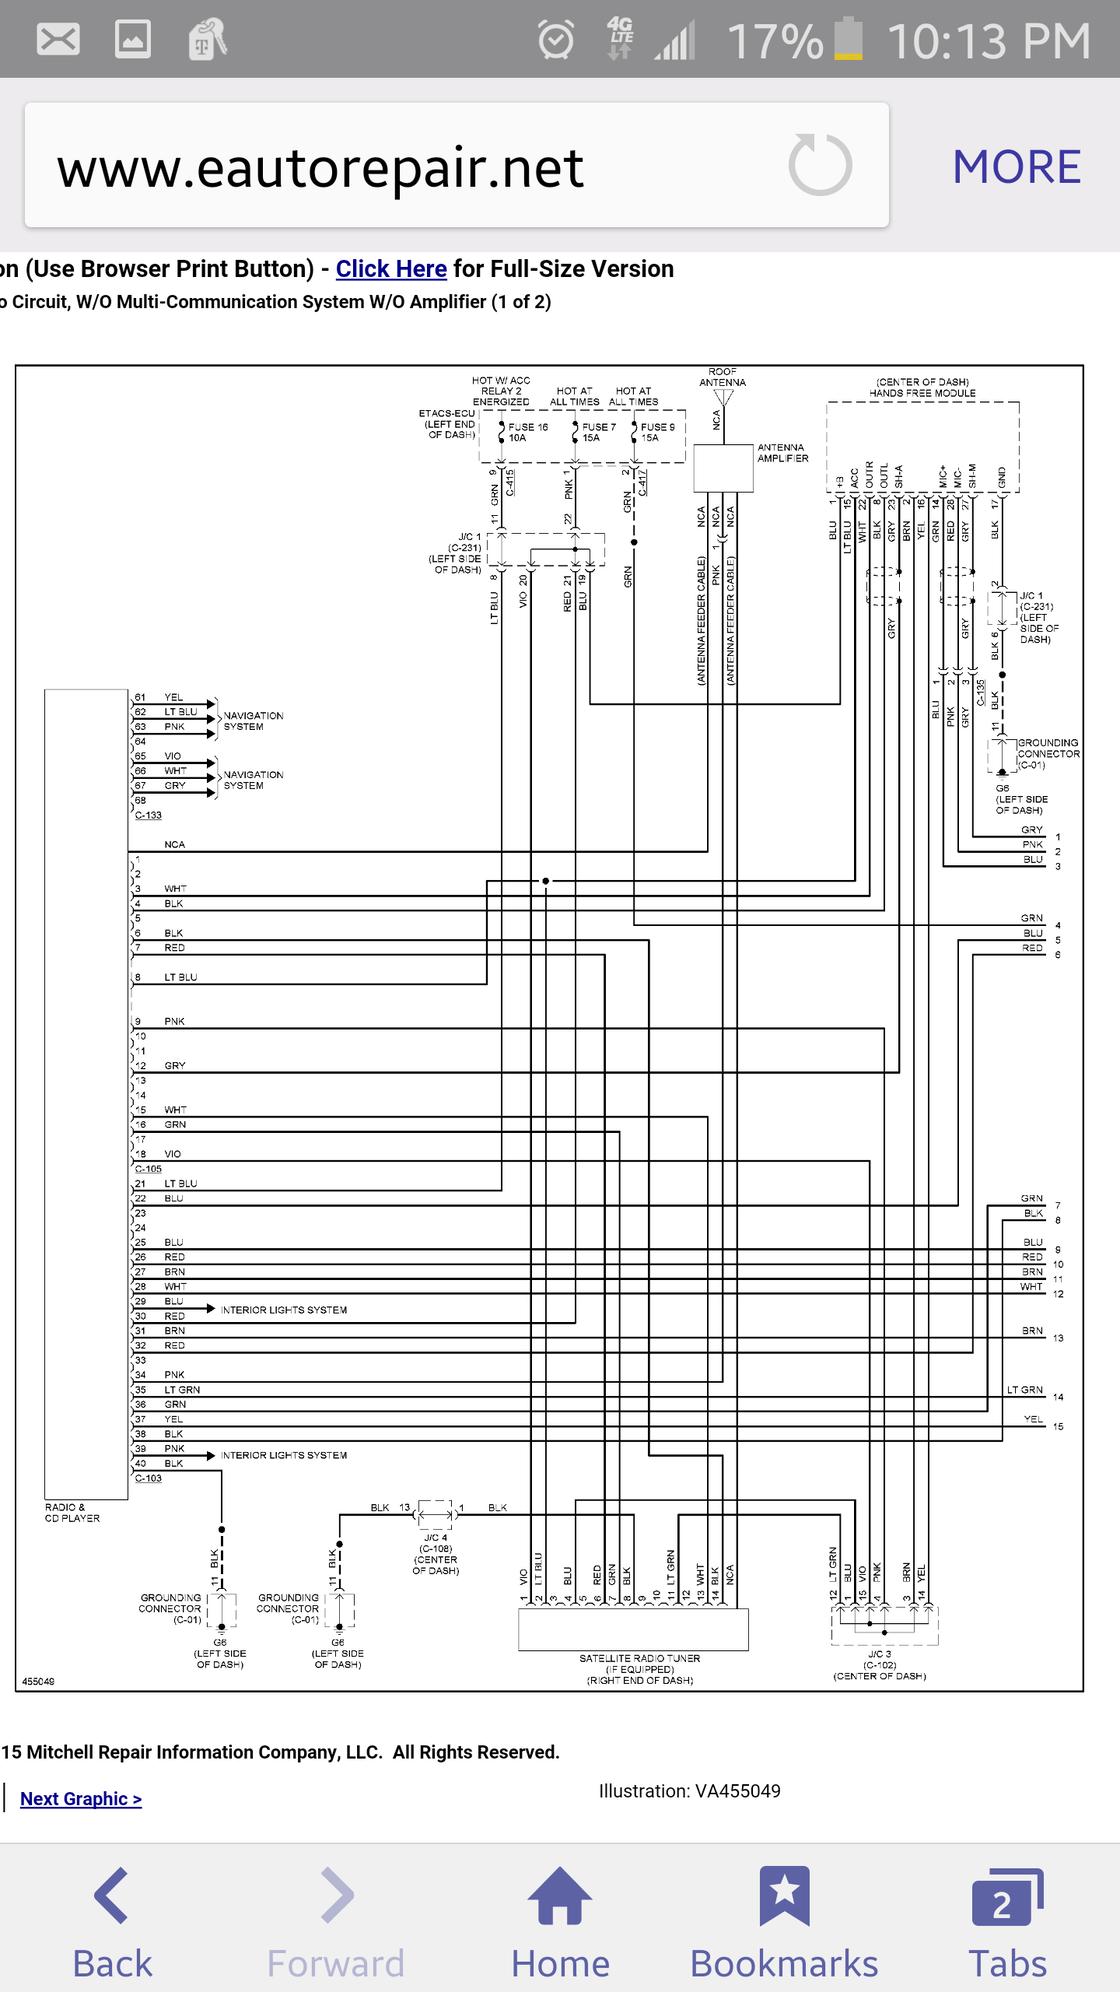 95 galant wiring diagram wiring design a home network example of 2001 mitsubishi mirage wiring diagram 95 Mitsubishi Strong 95 4Runner Wiring Diagram on 95 galant wiring diagram